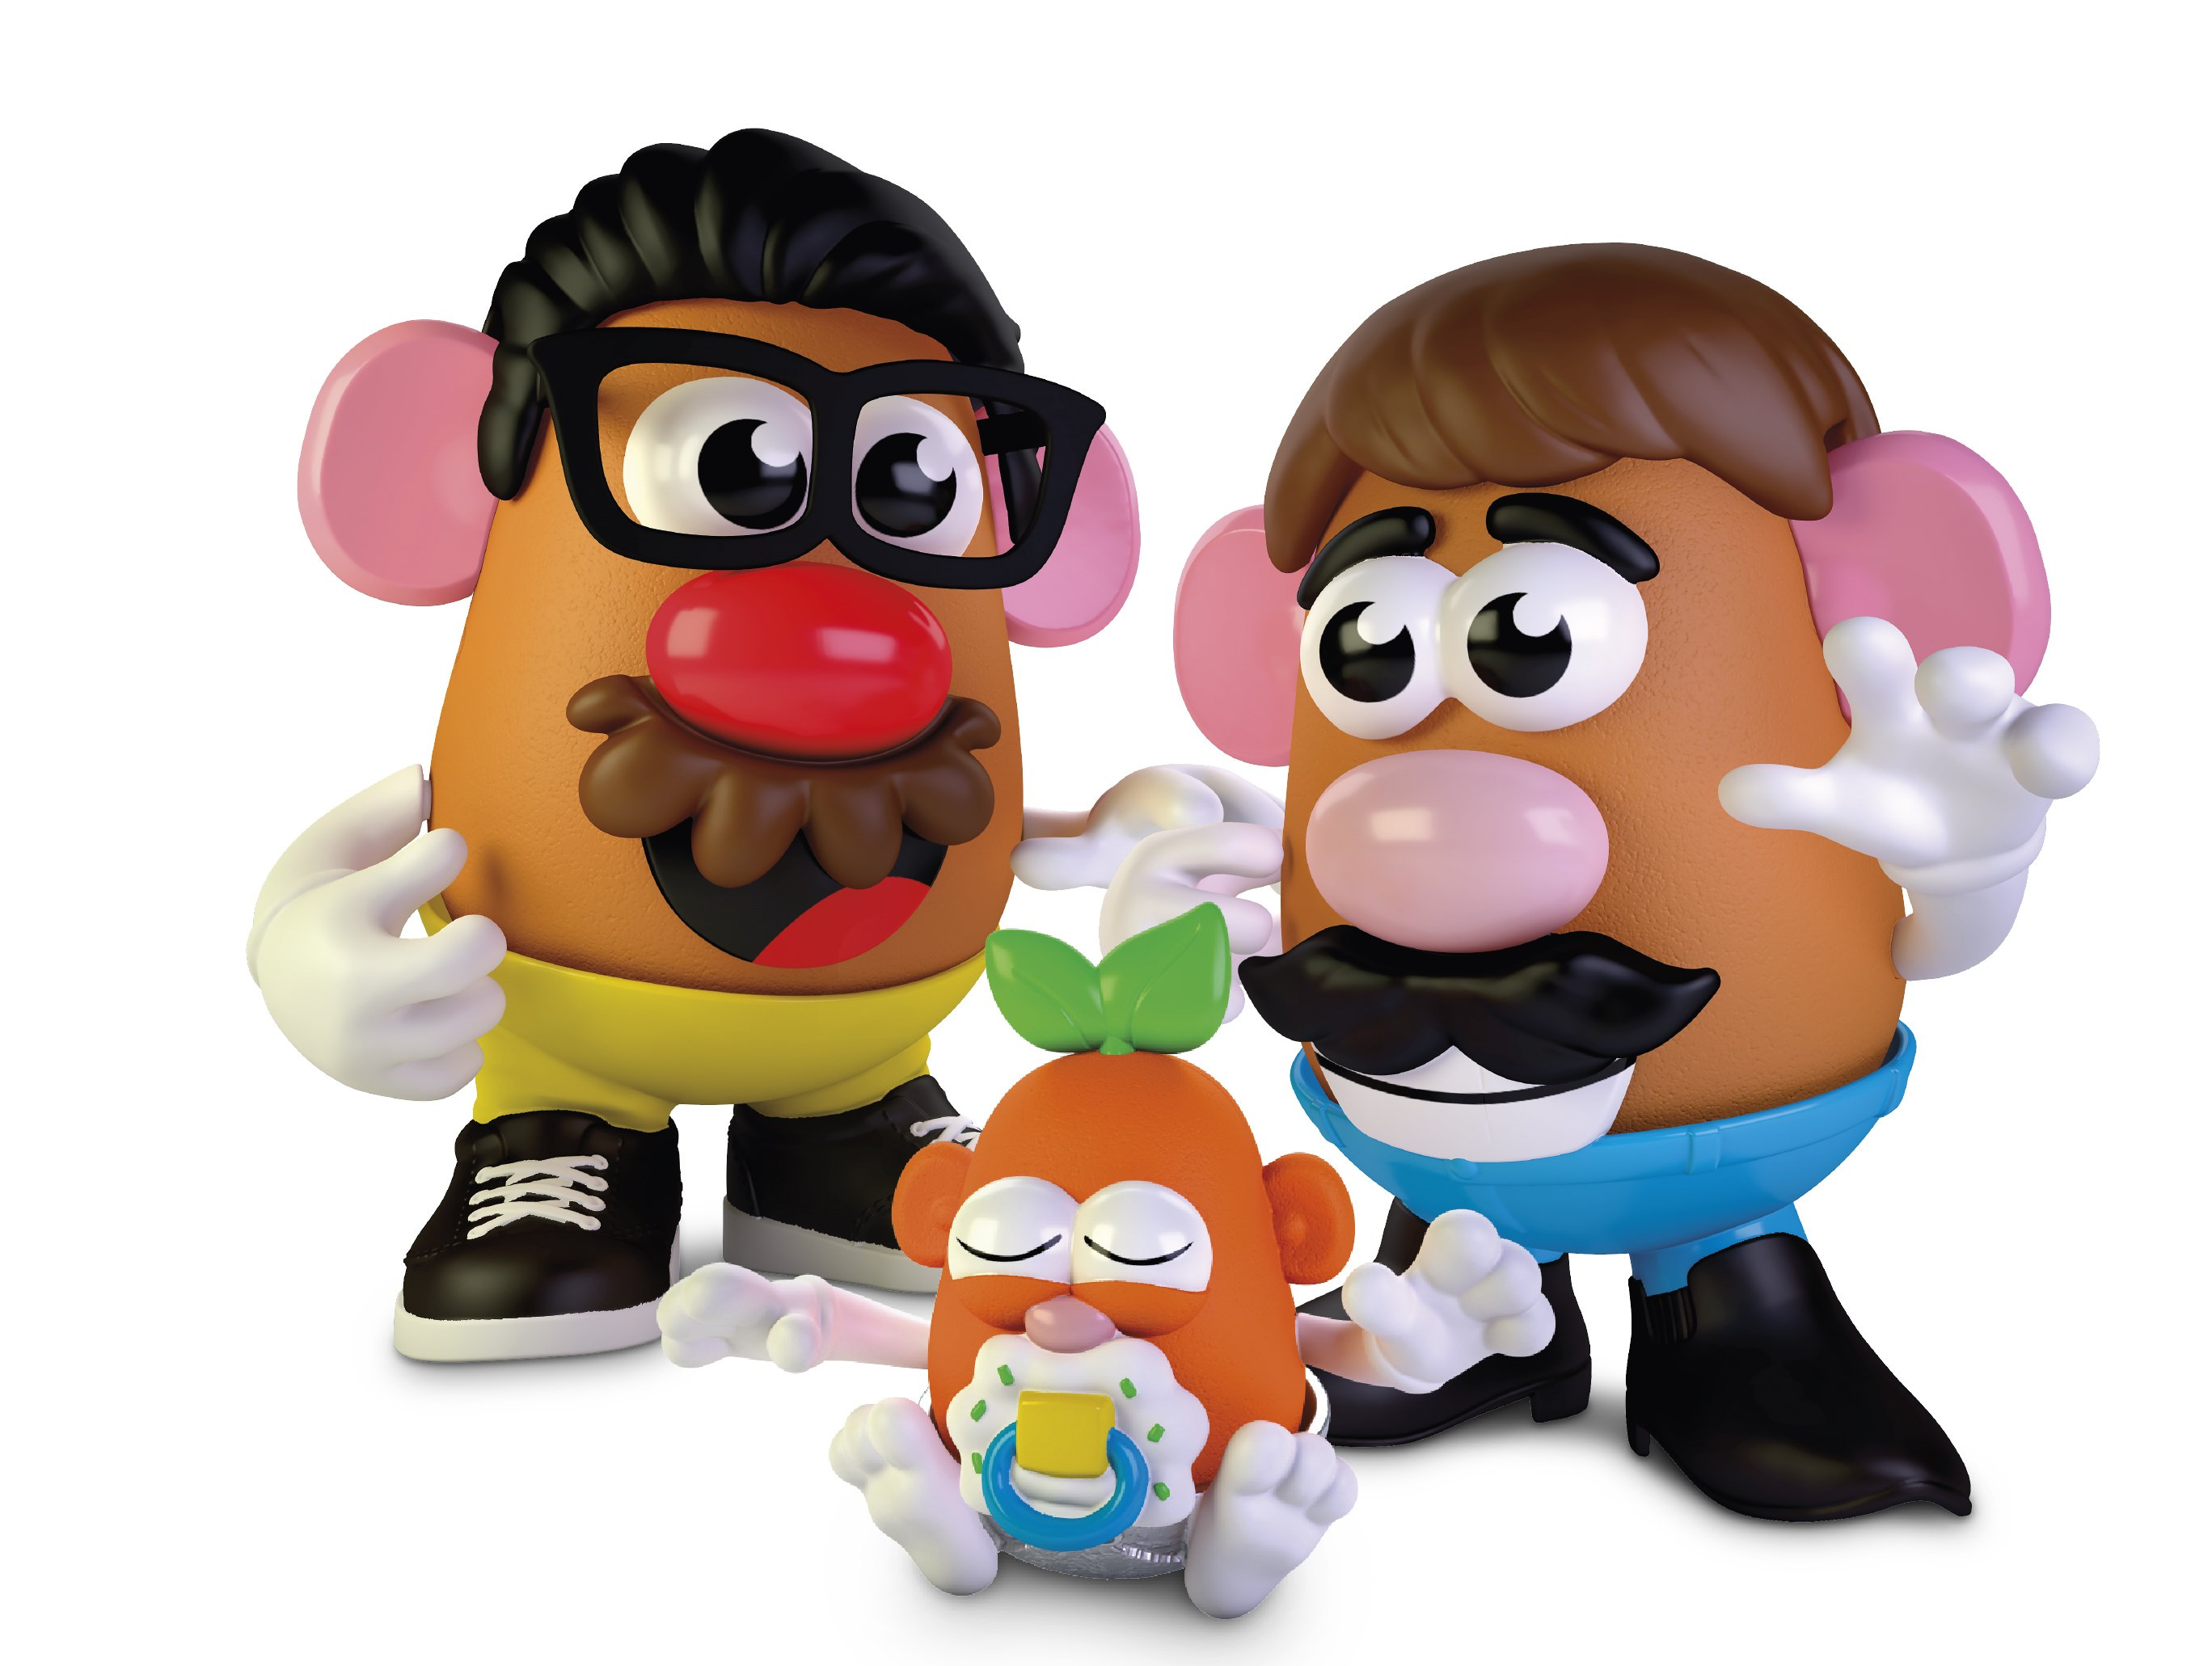 Current Status: Mr. Potato Head drops the mister, sort of